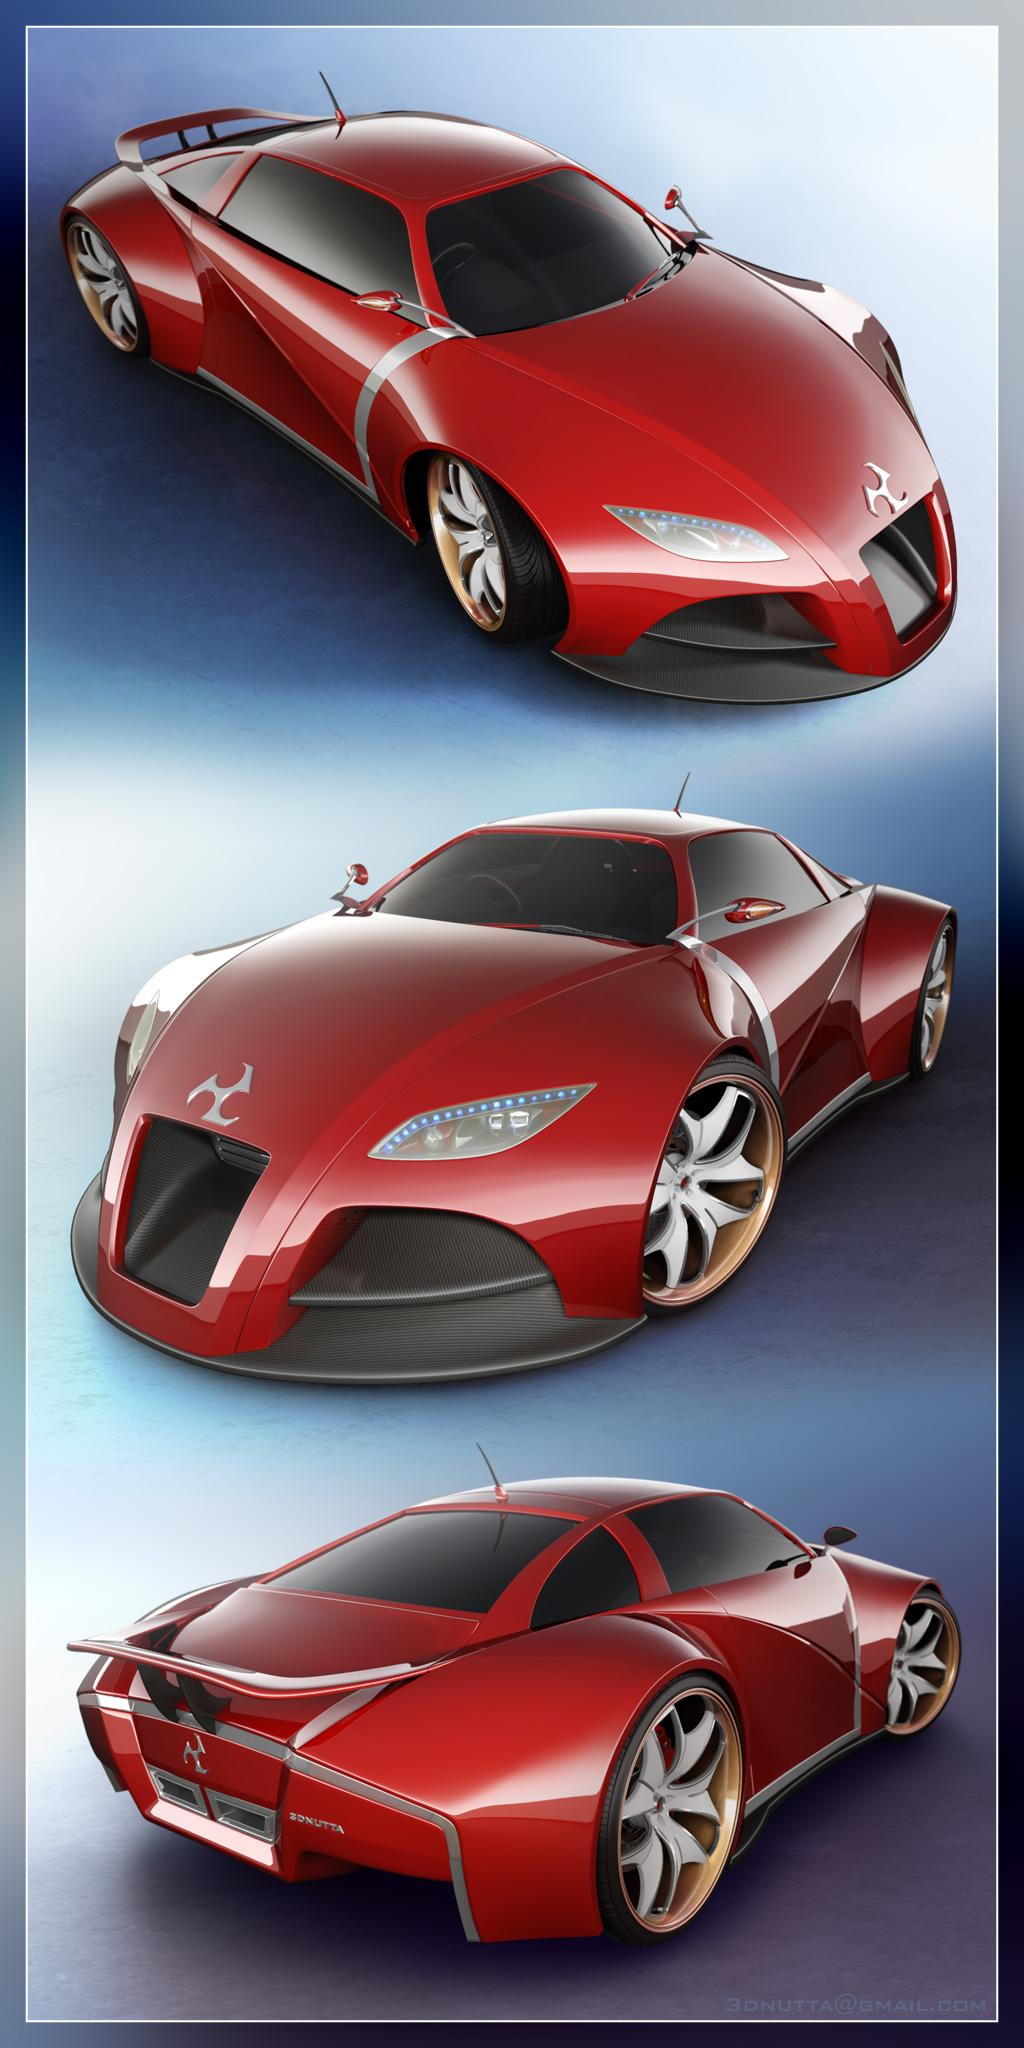 Concept Car V2 - Panel by 3DnuTTa